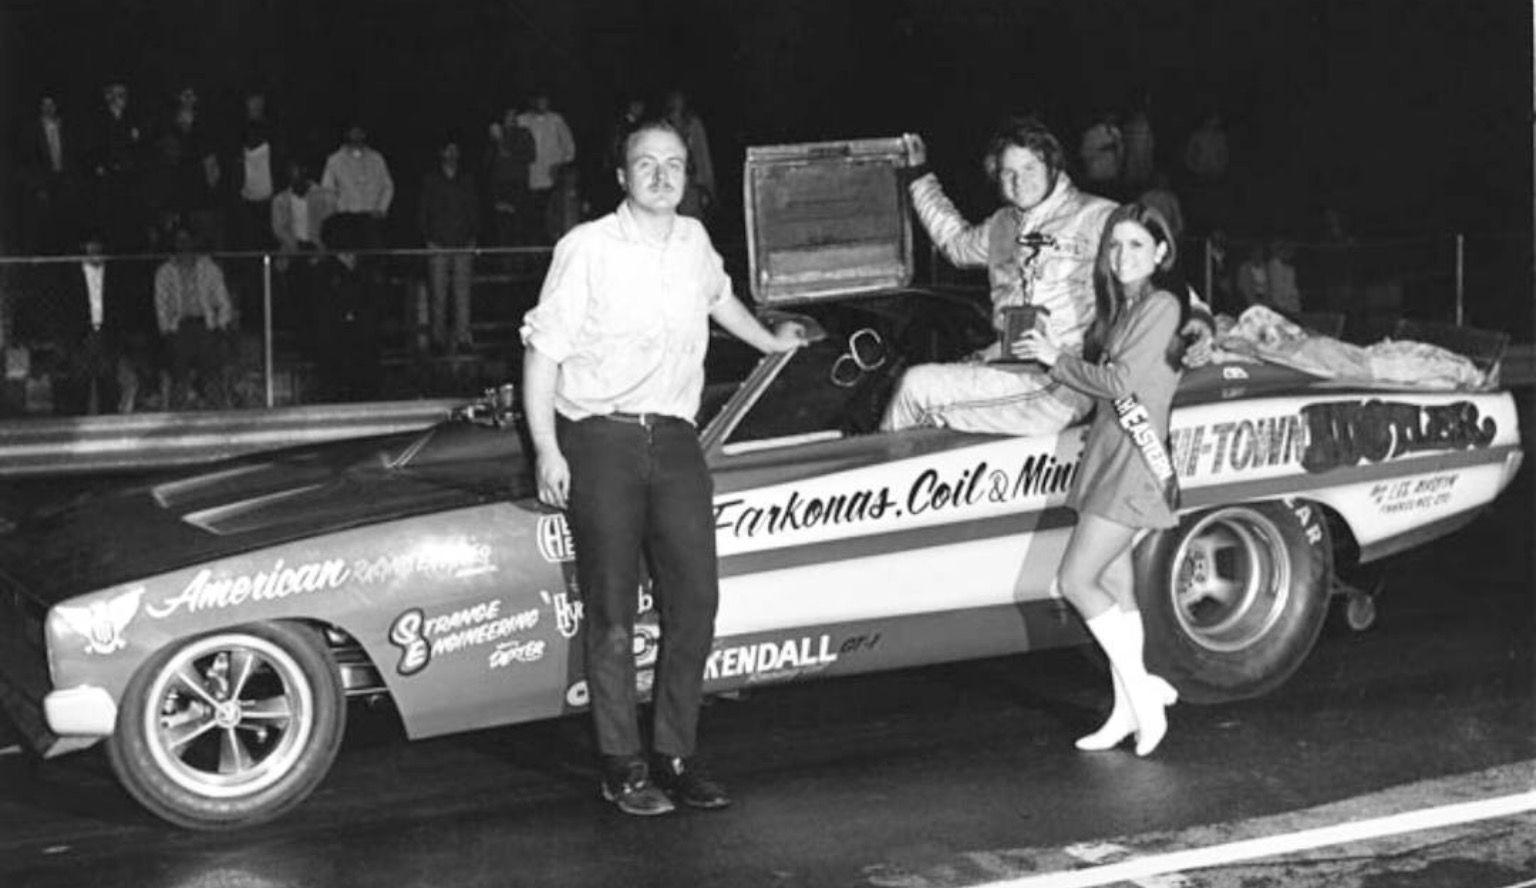 Pin By Striptnut On When It Was Fun Car Humor Funny Car Drag Racing Racing Car Model